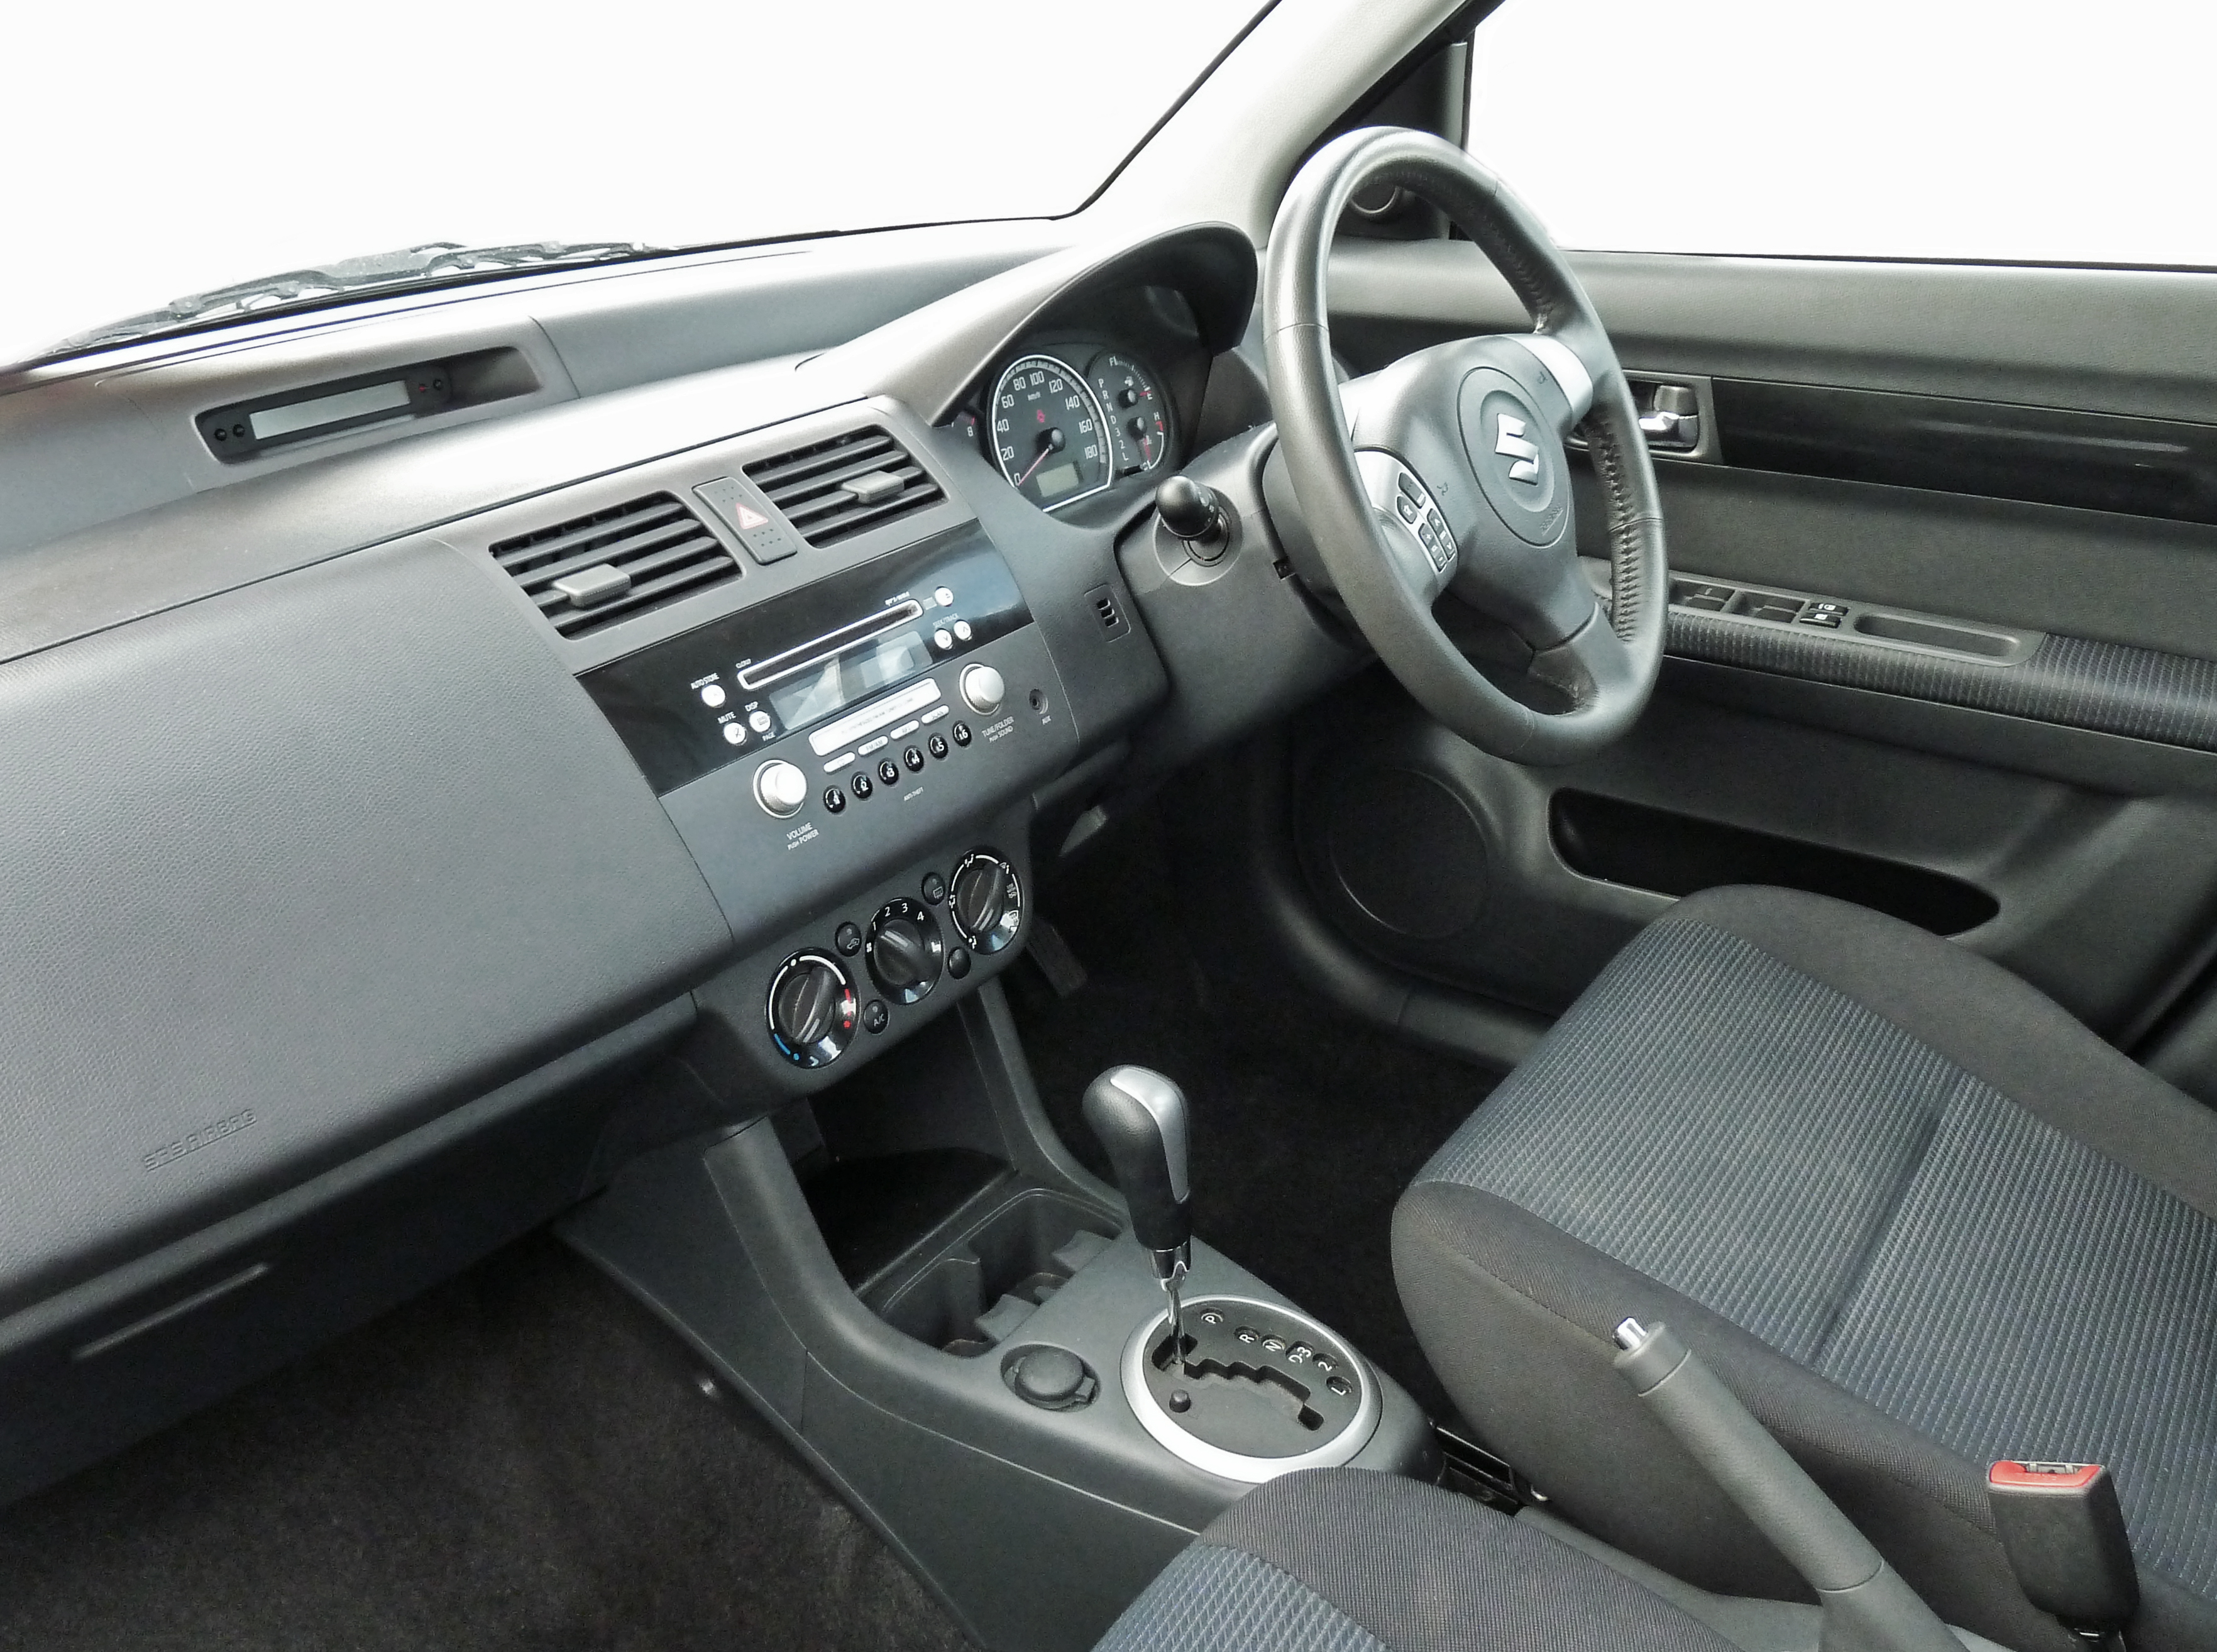 Suzuki Liana Dashboard Price In Pakistan